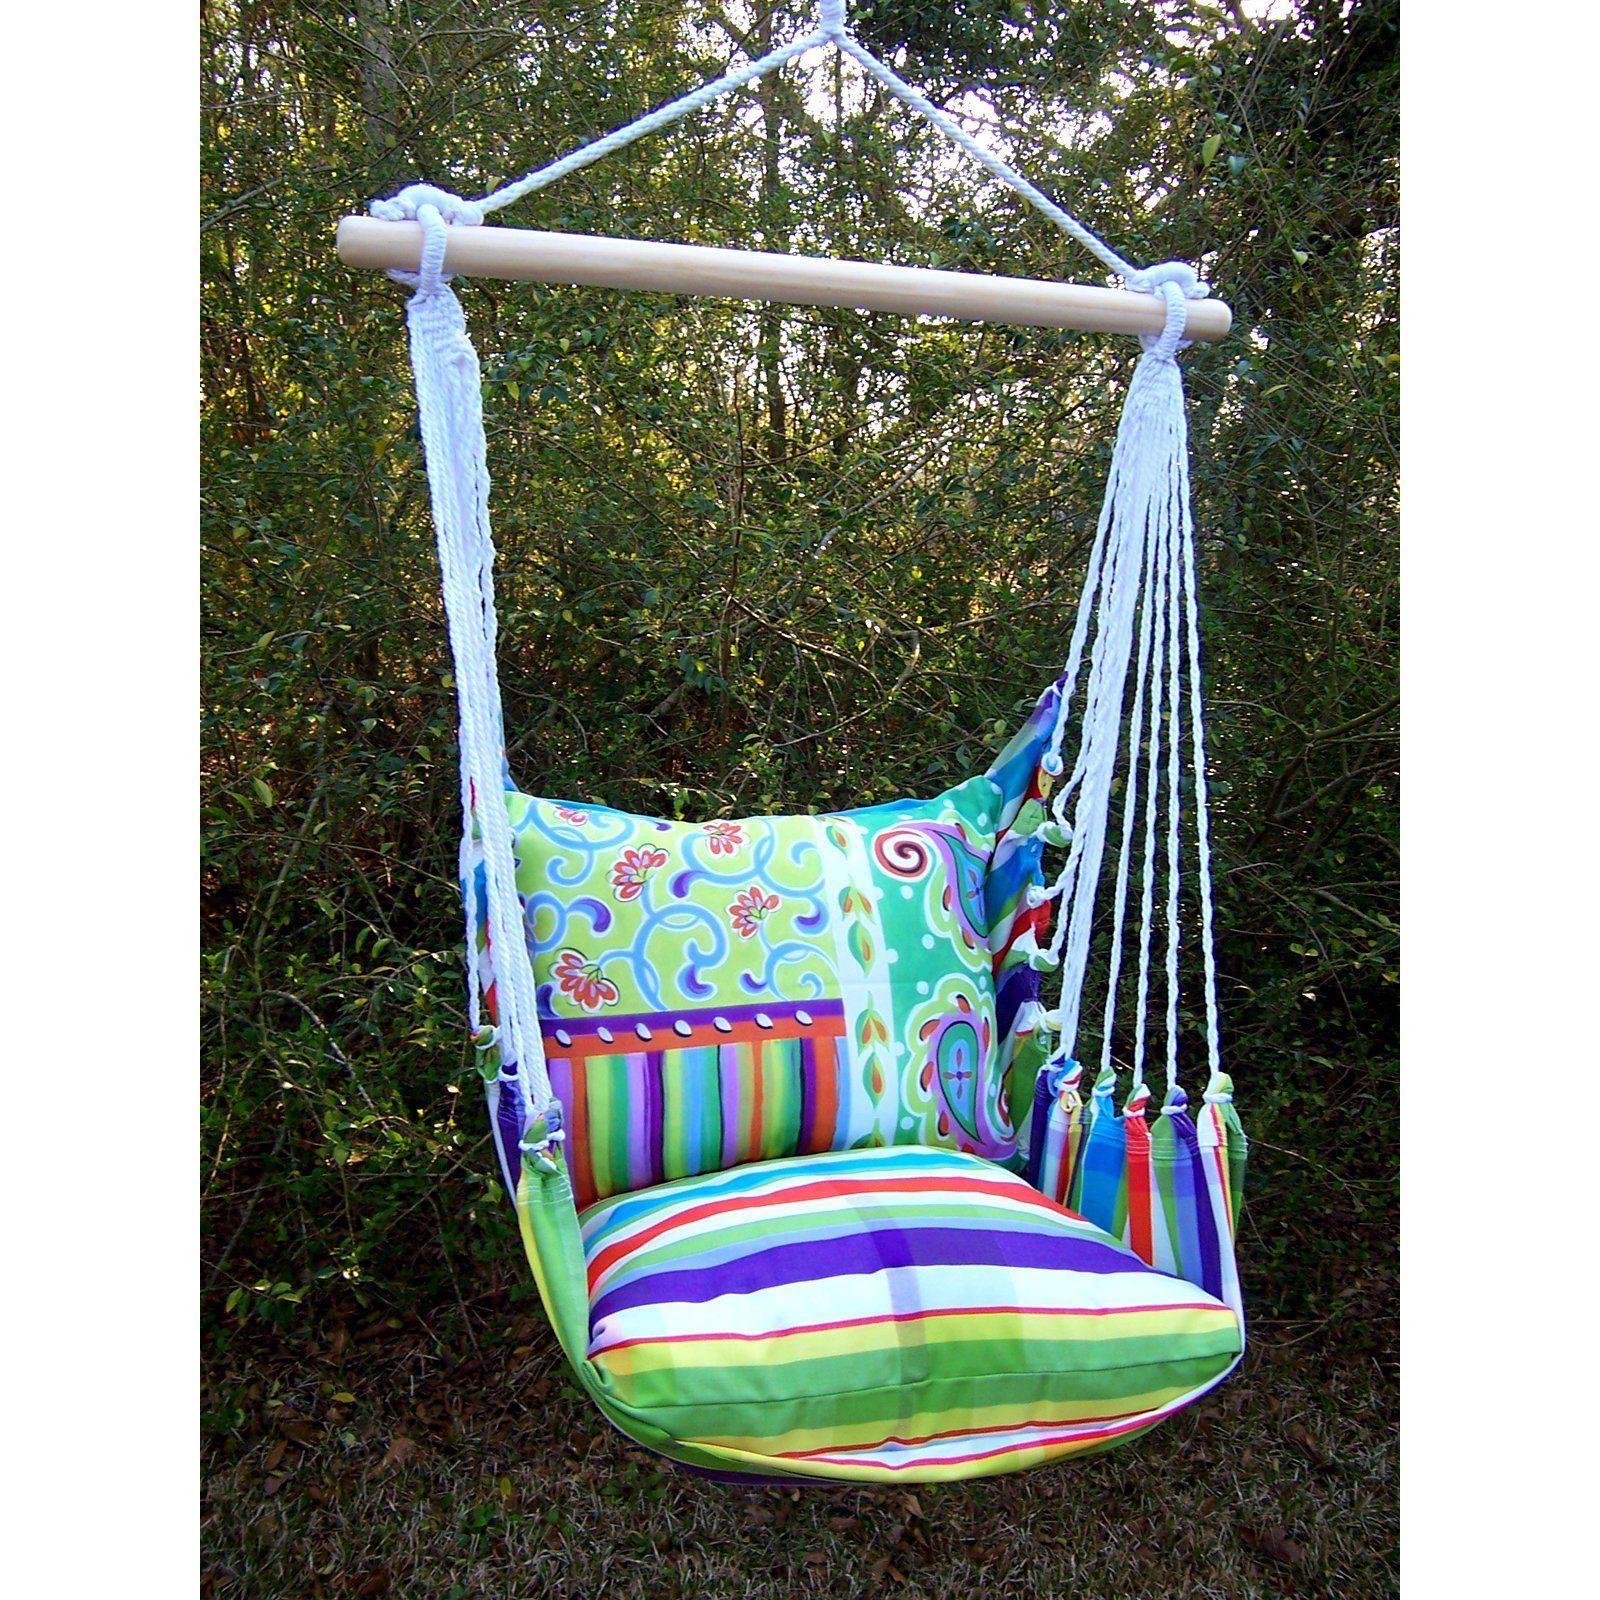 Indoor Swing Chair Nz Walmart Wheelchair Covers Have To It Magnolia Casual Fine Gardening Outdoor